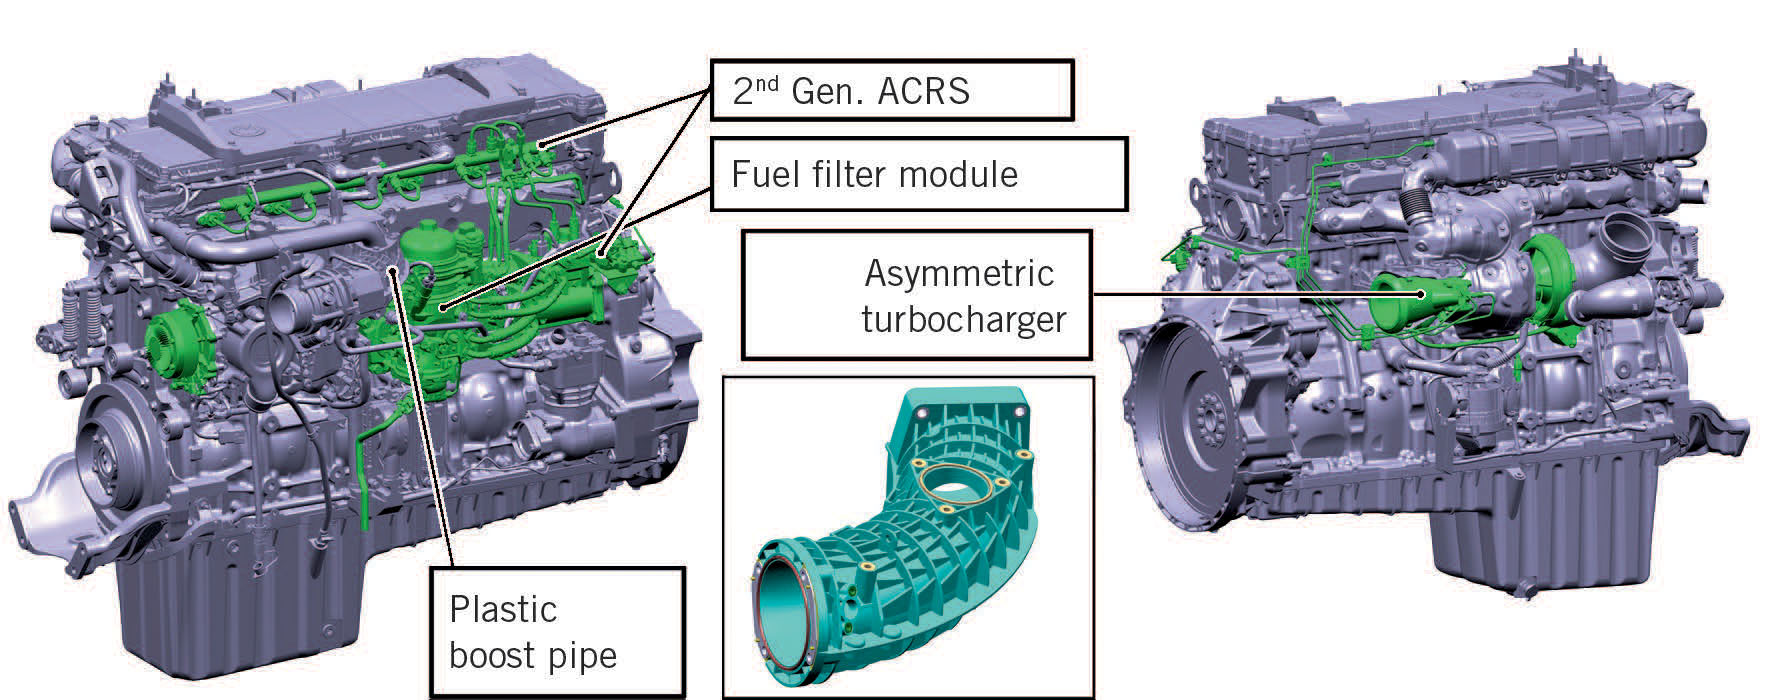 New 14 8-l HD Truck Engine from Daimler for NAFTA | SpringerLink